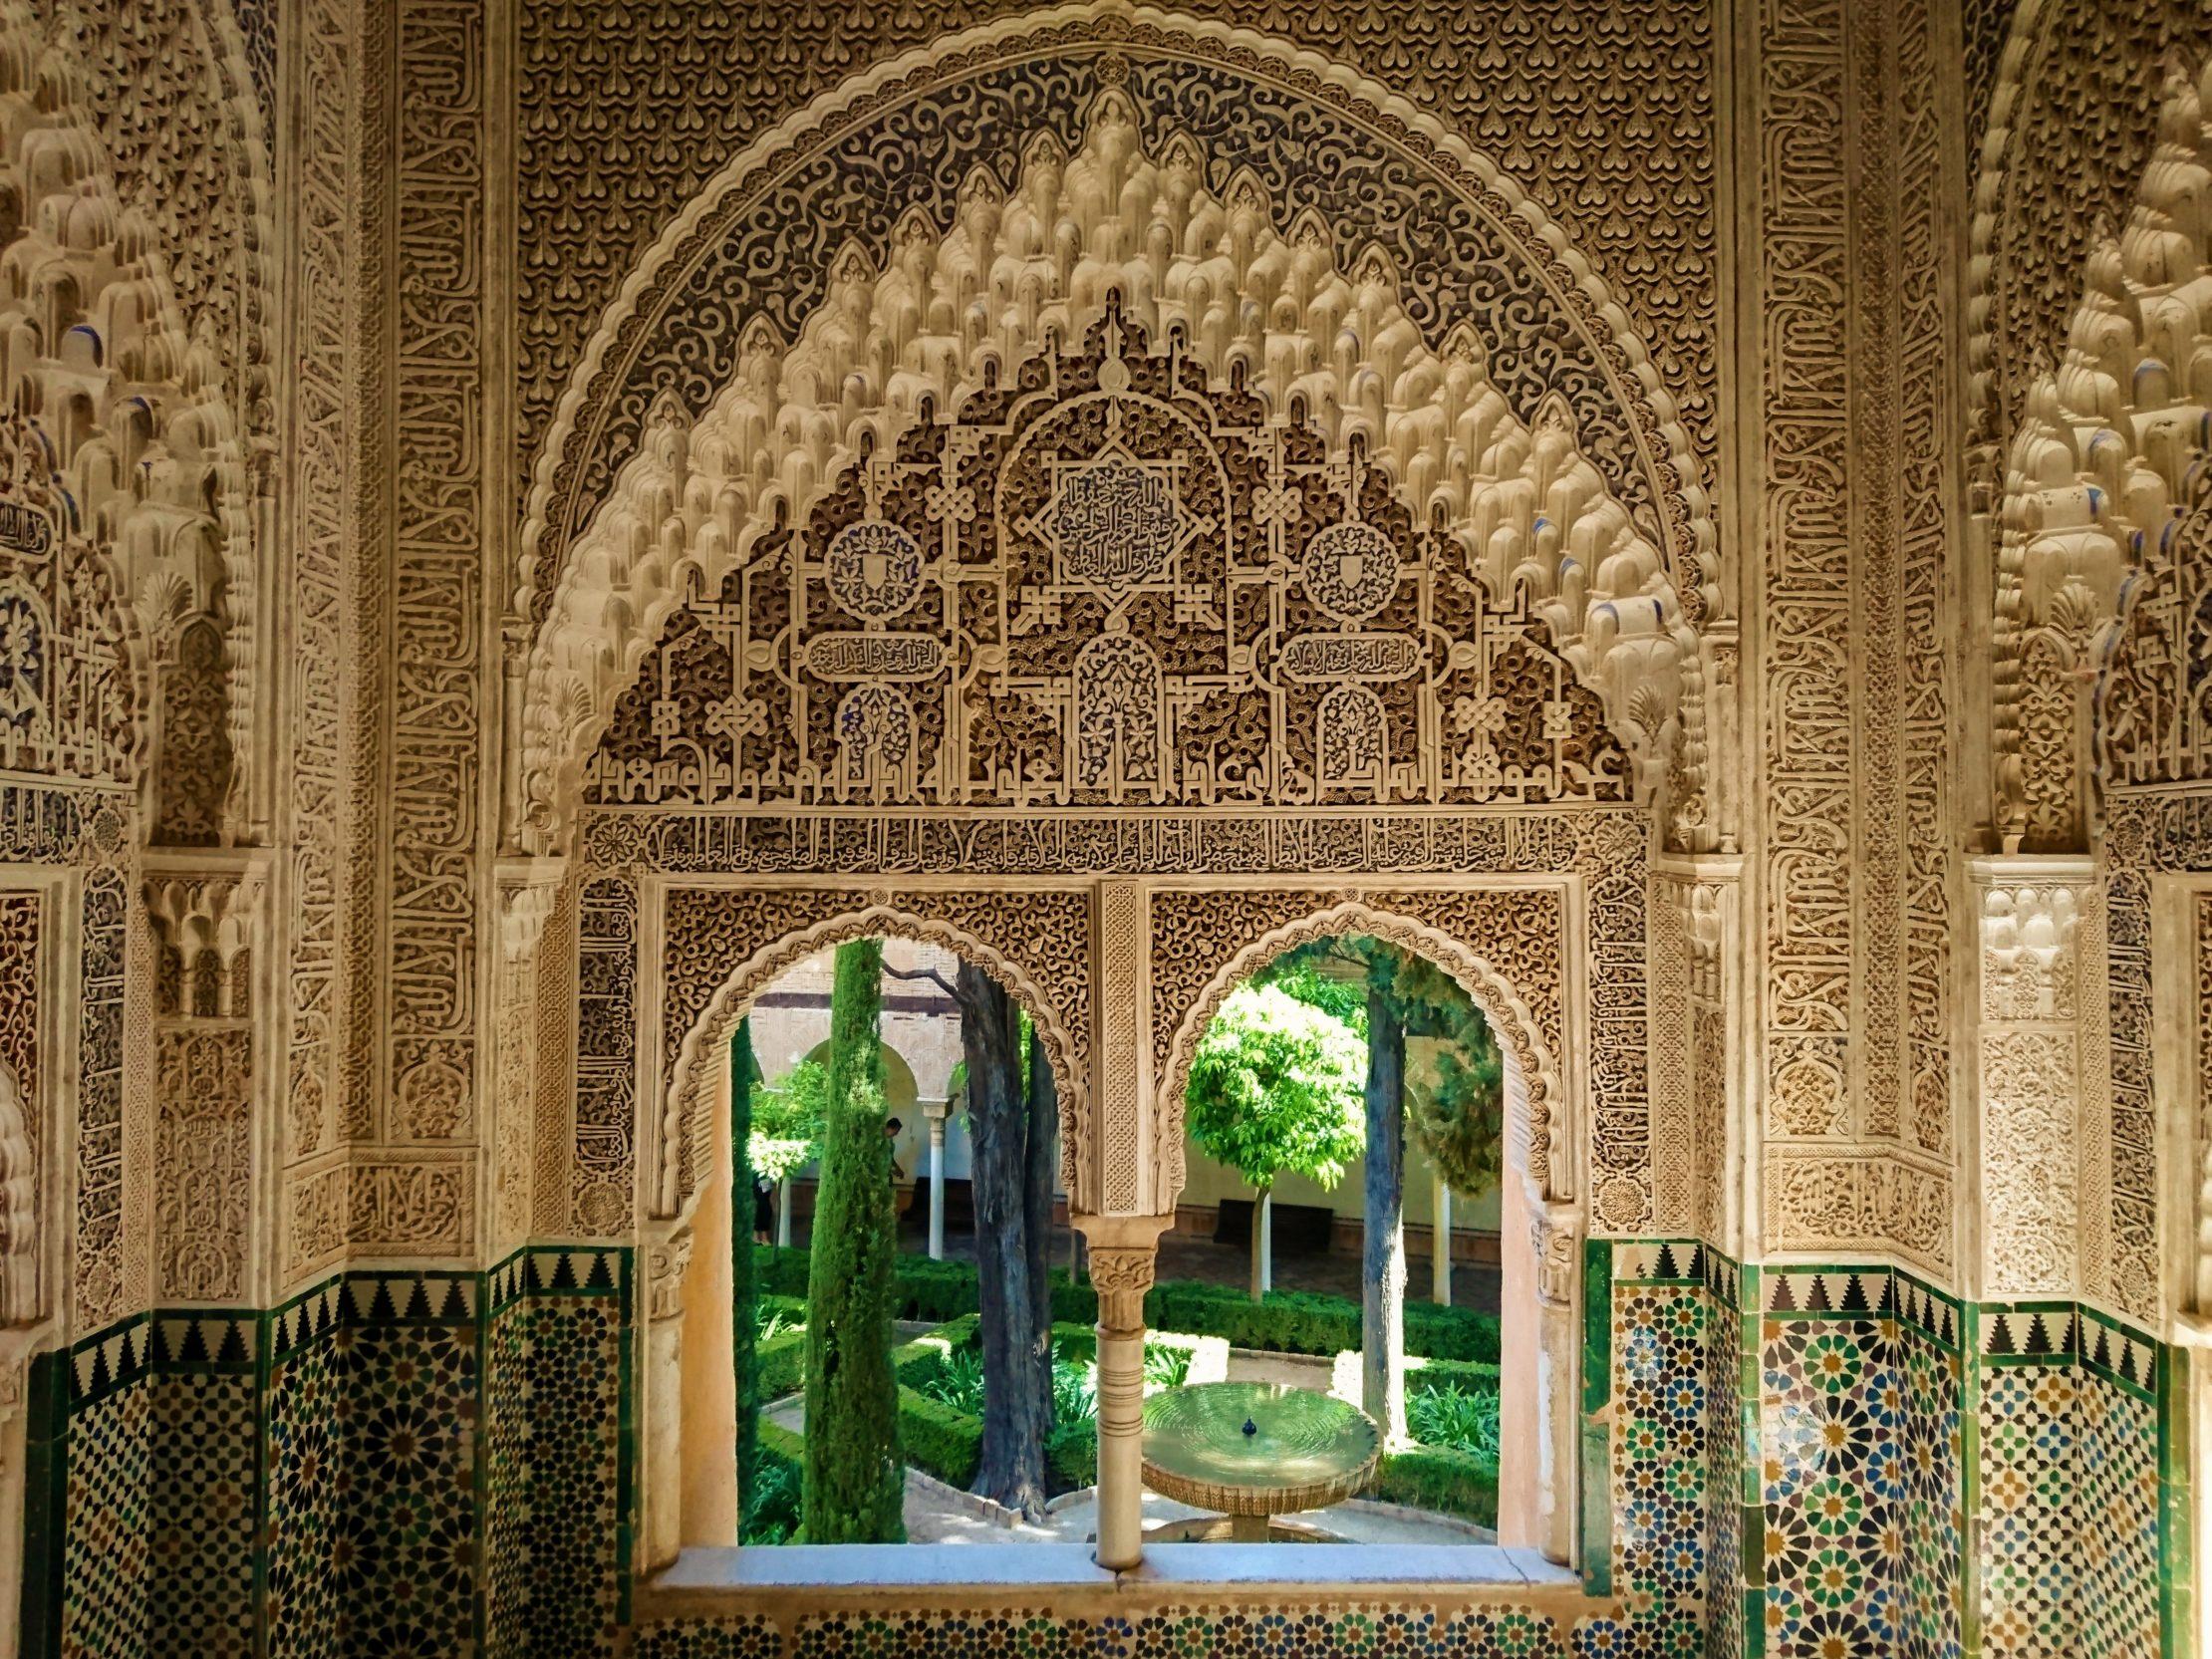 La Alhambra en Granada, Espana - guia de viaje